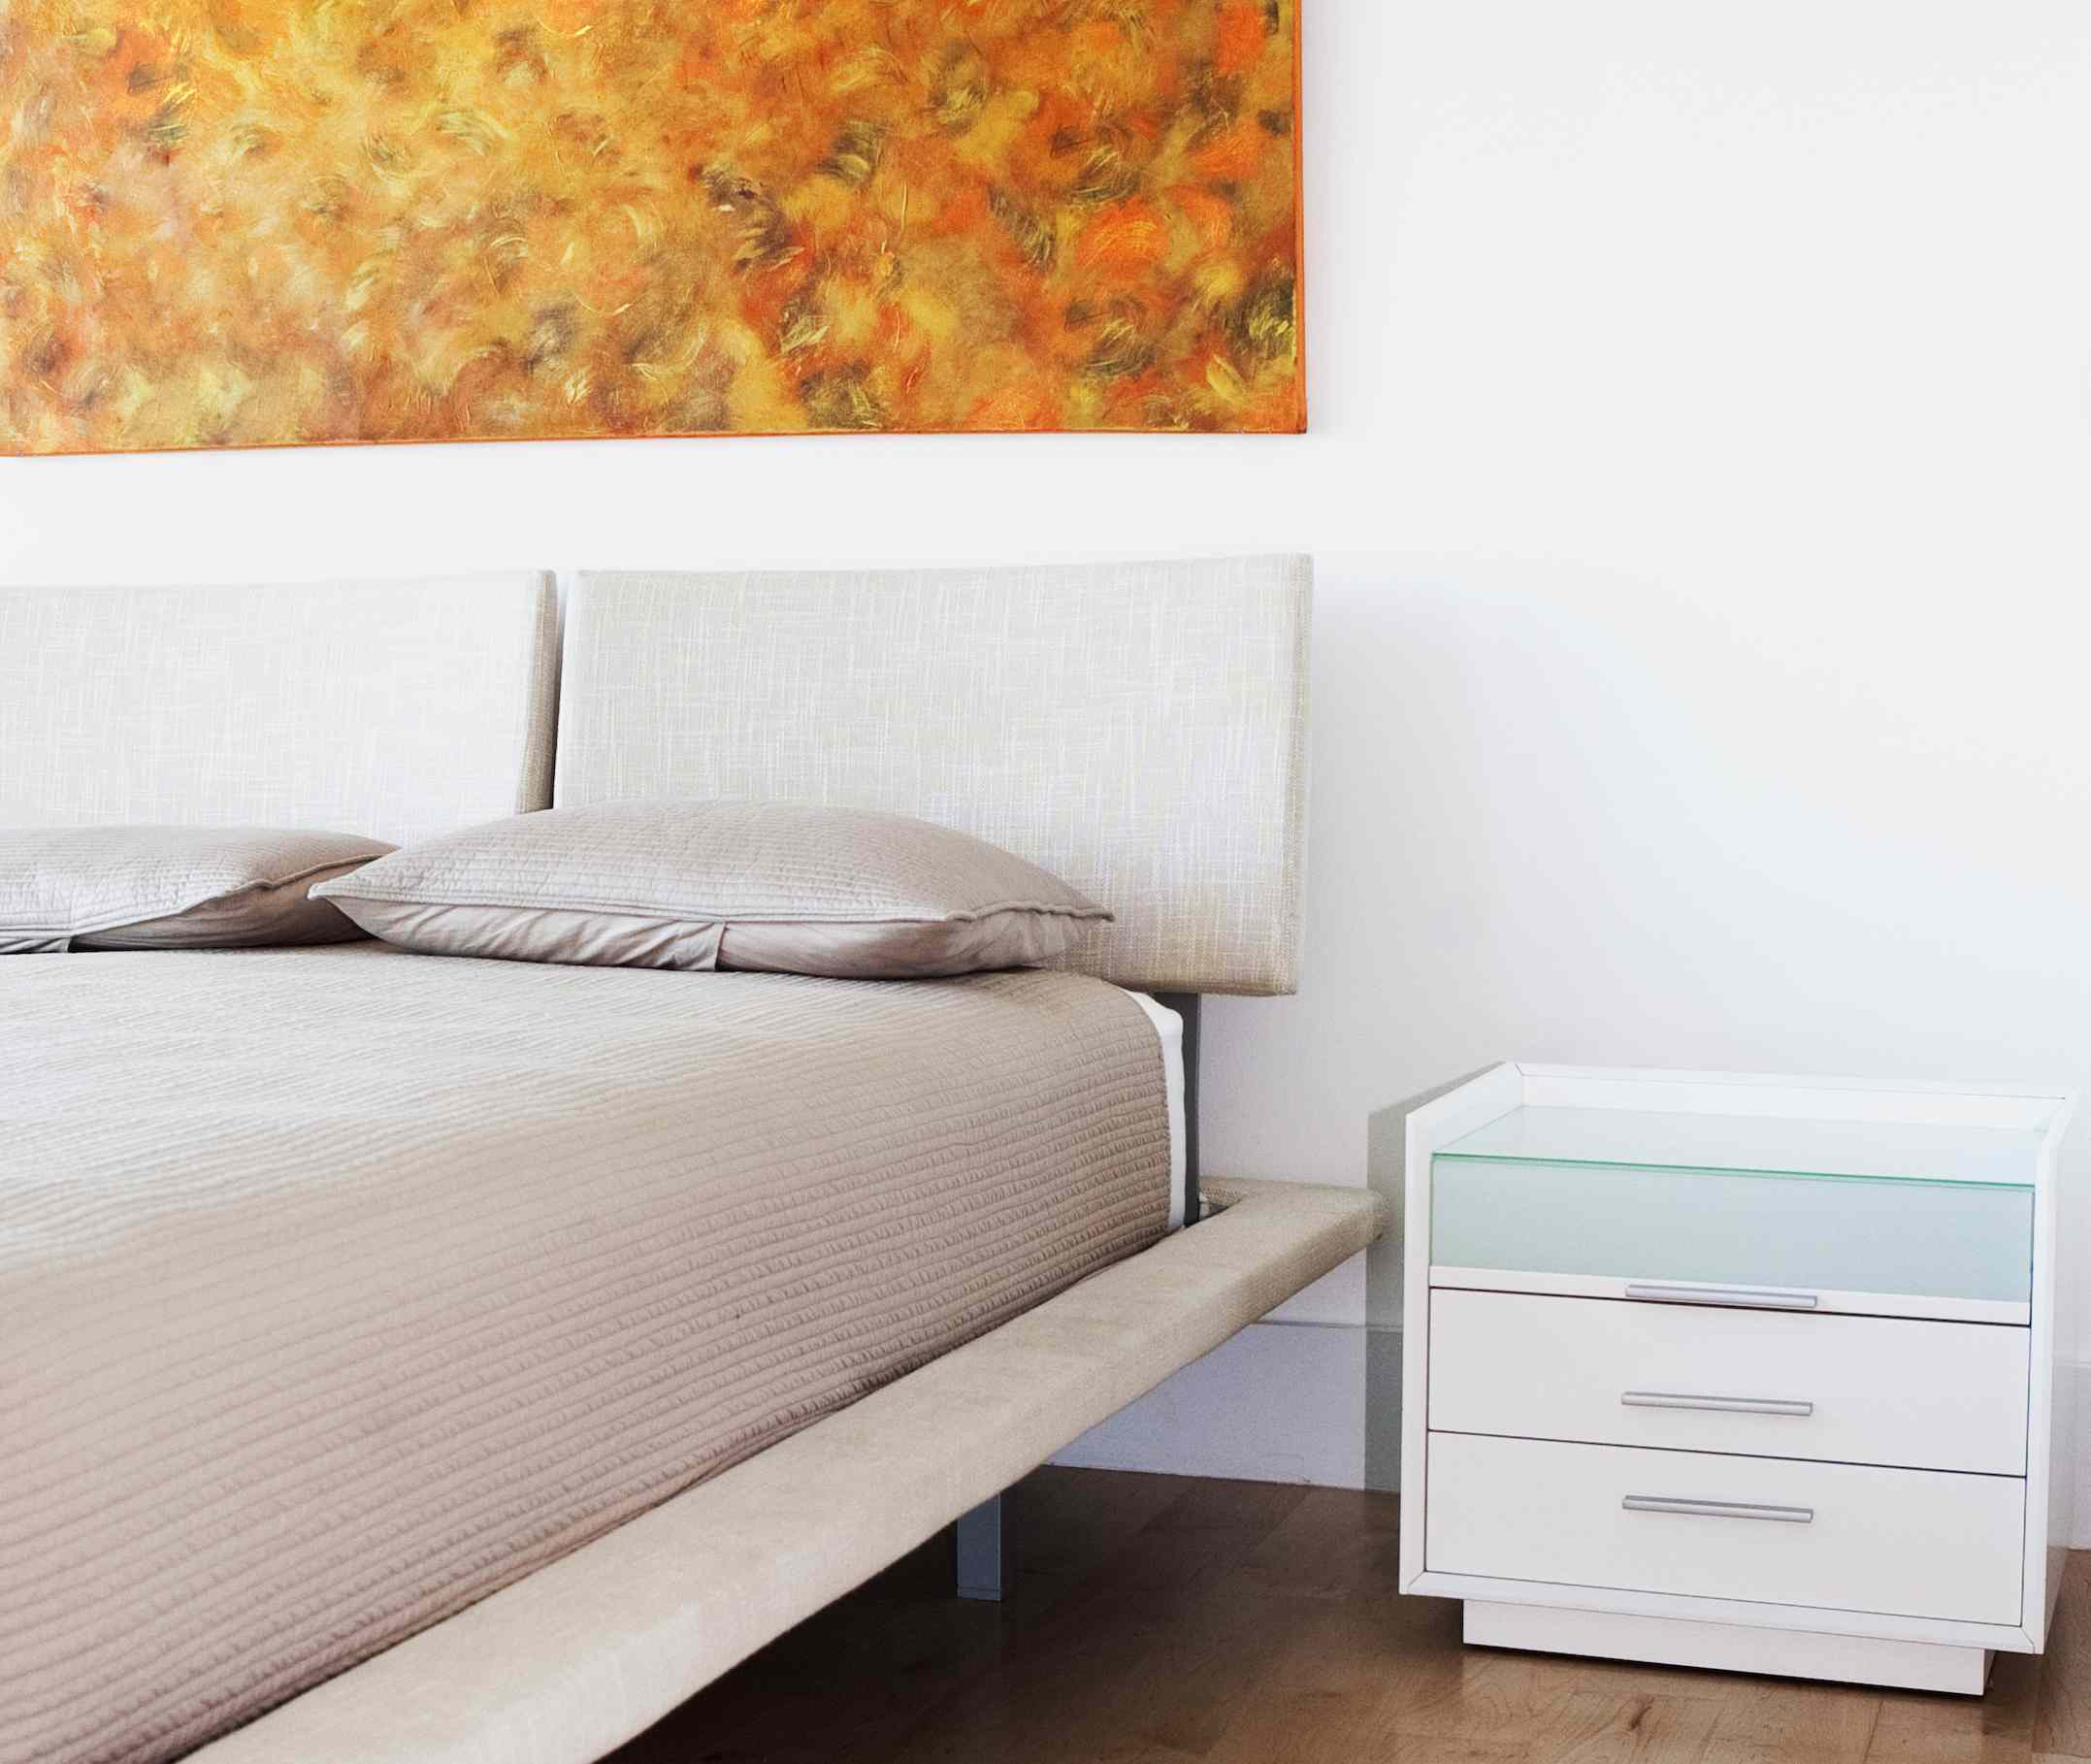 10 Worst Feng Shui Bed Headboards